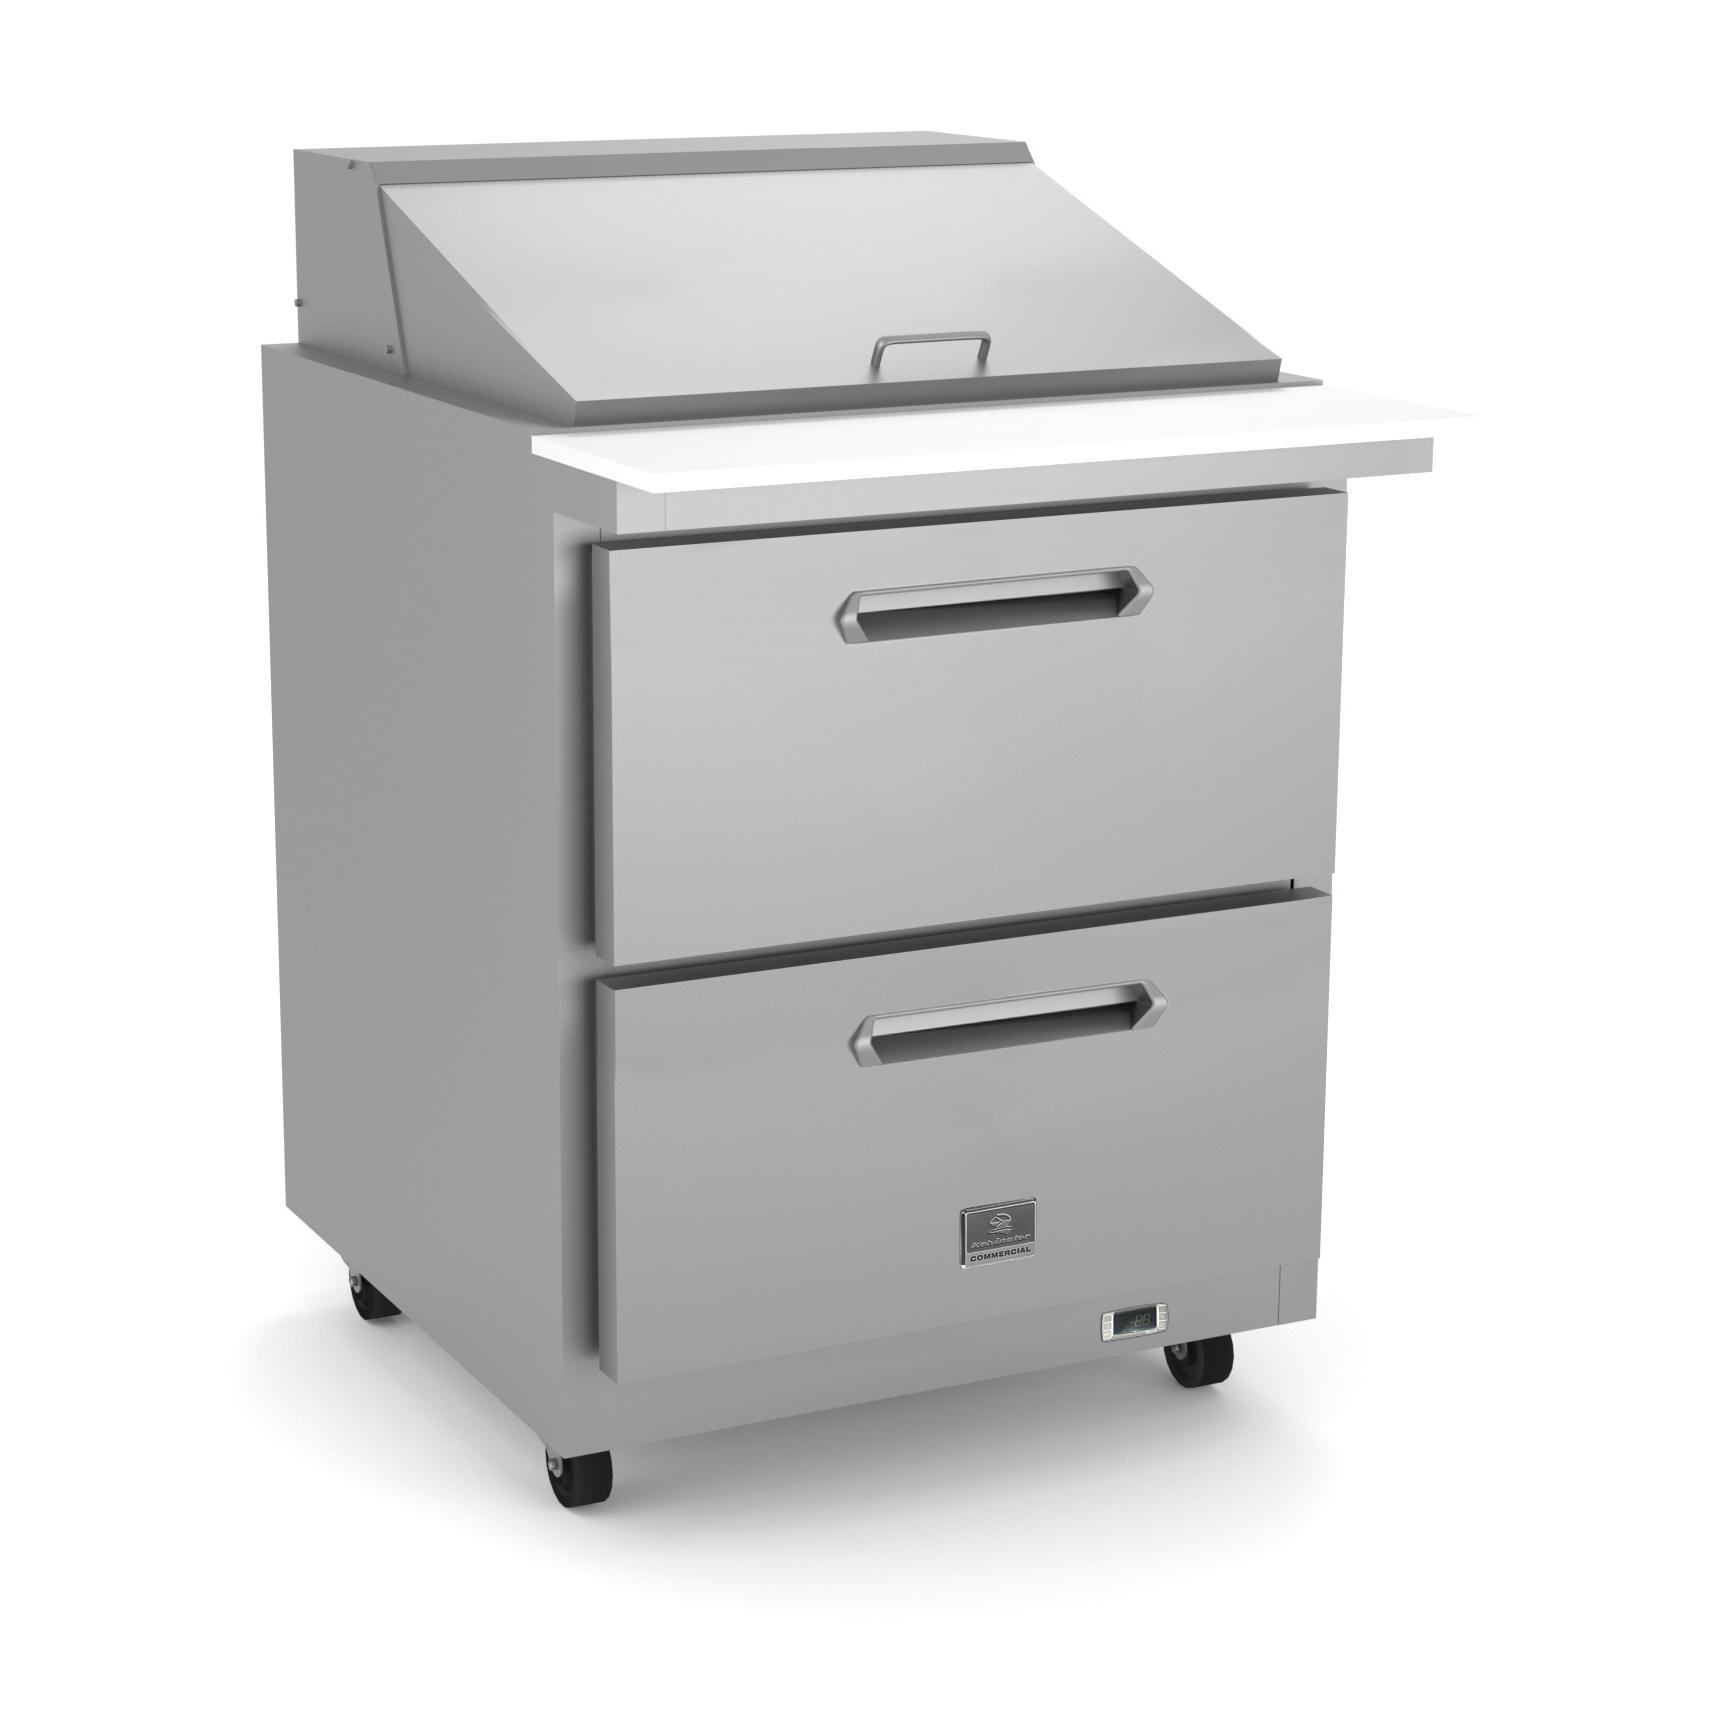 Kelvinator Commercial KCHMT29.12.2D refrigerated counter, mega top sandwich / salad unit